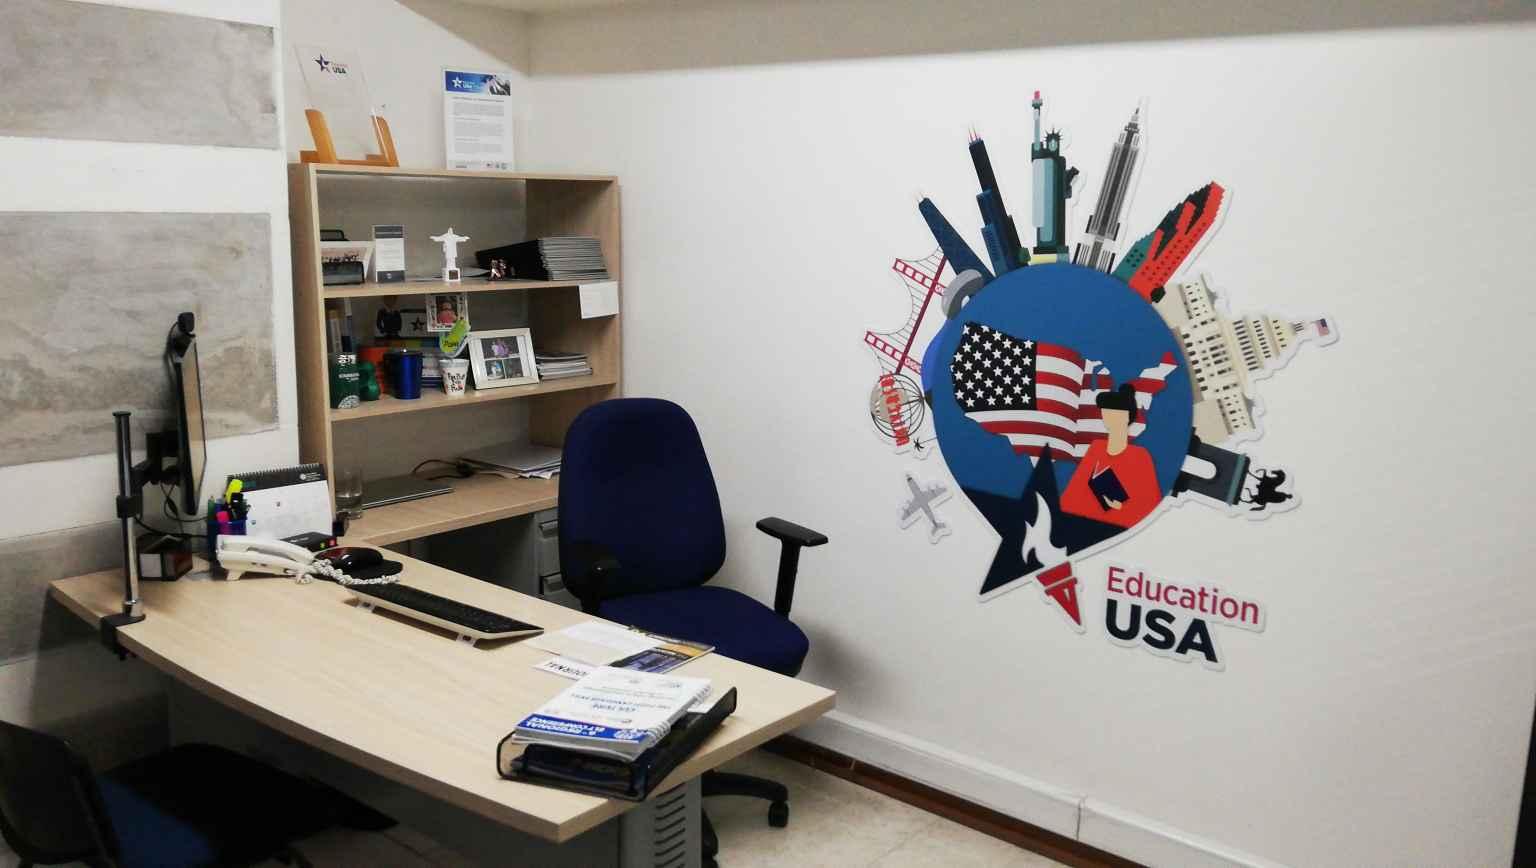 The EducationUSA Office